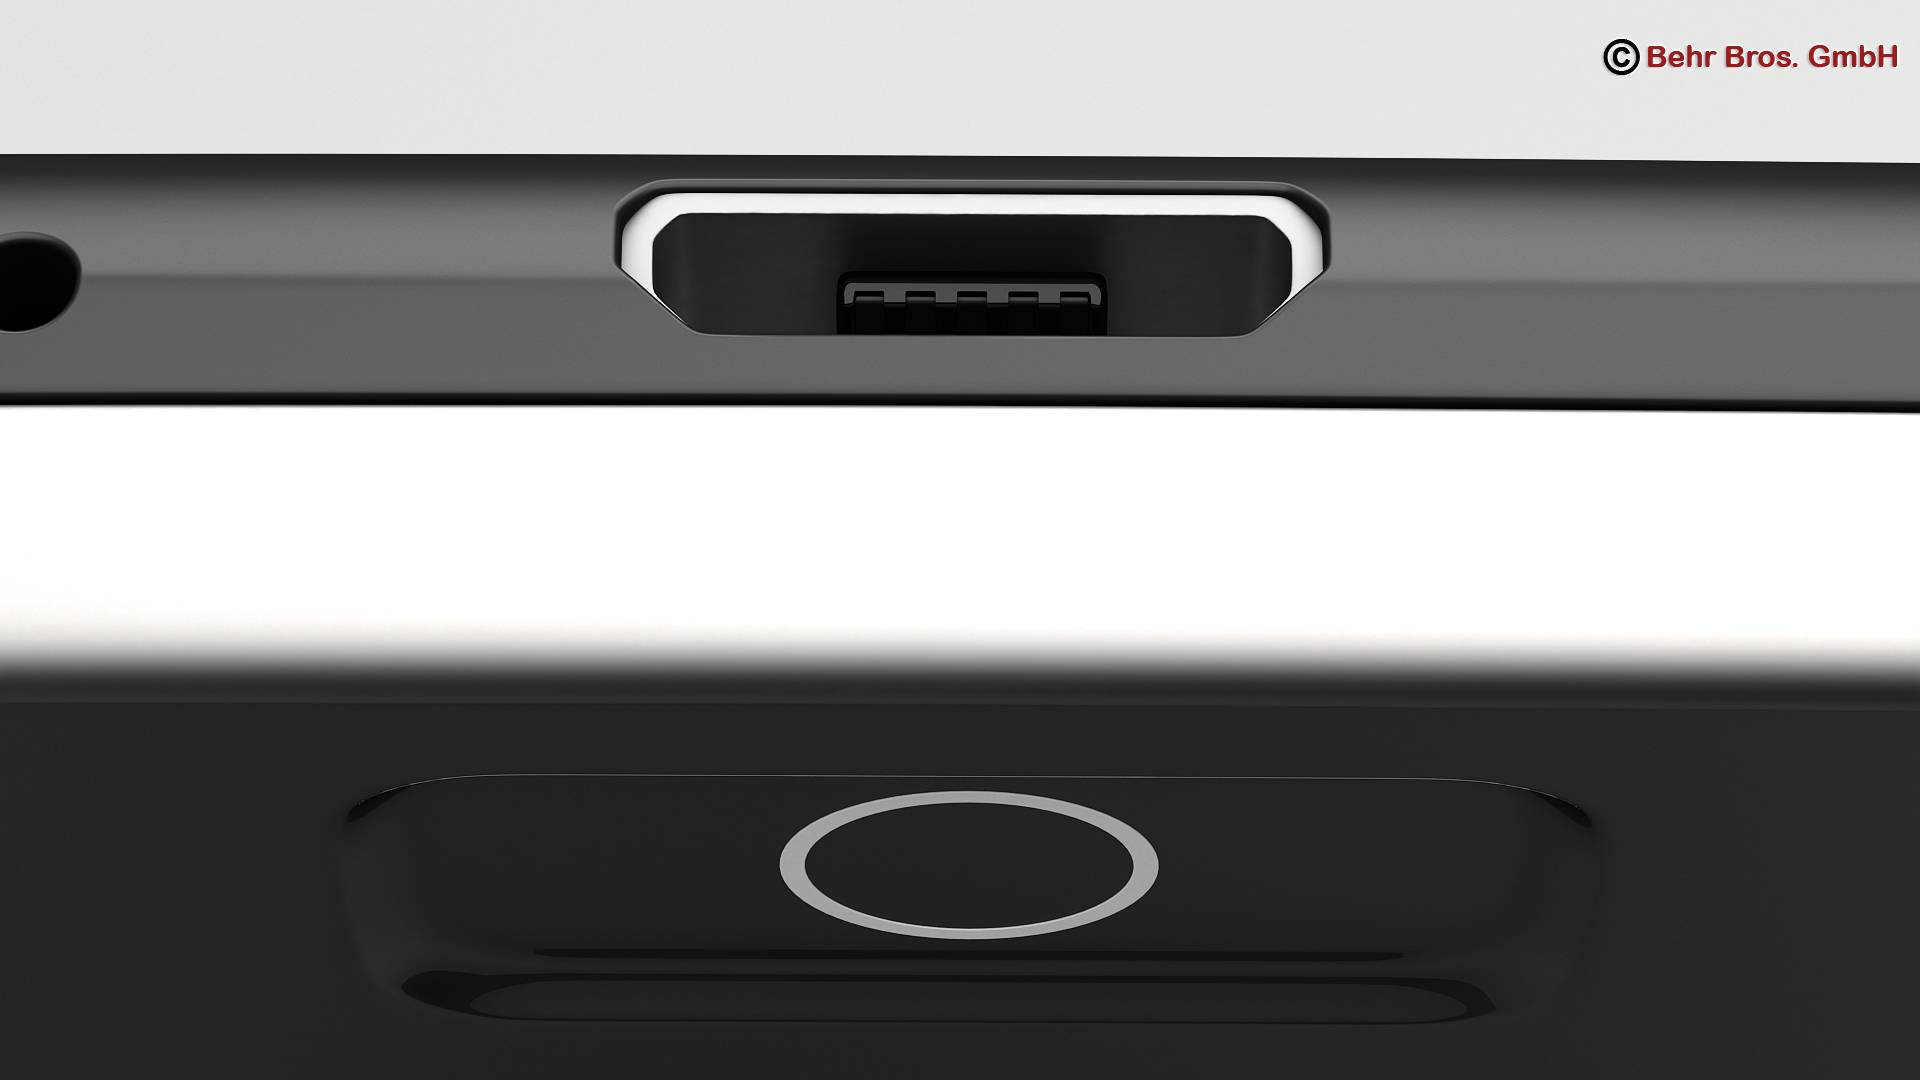 generic smartphone 4 inch 3d model 3ds max fbx c4d lwo ma mb obj 161629